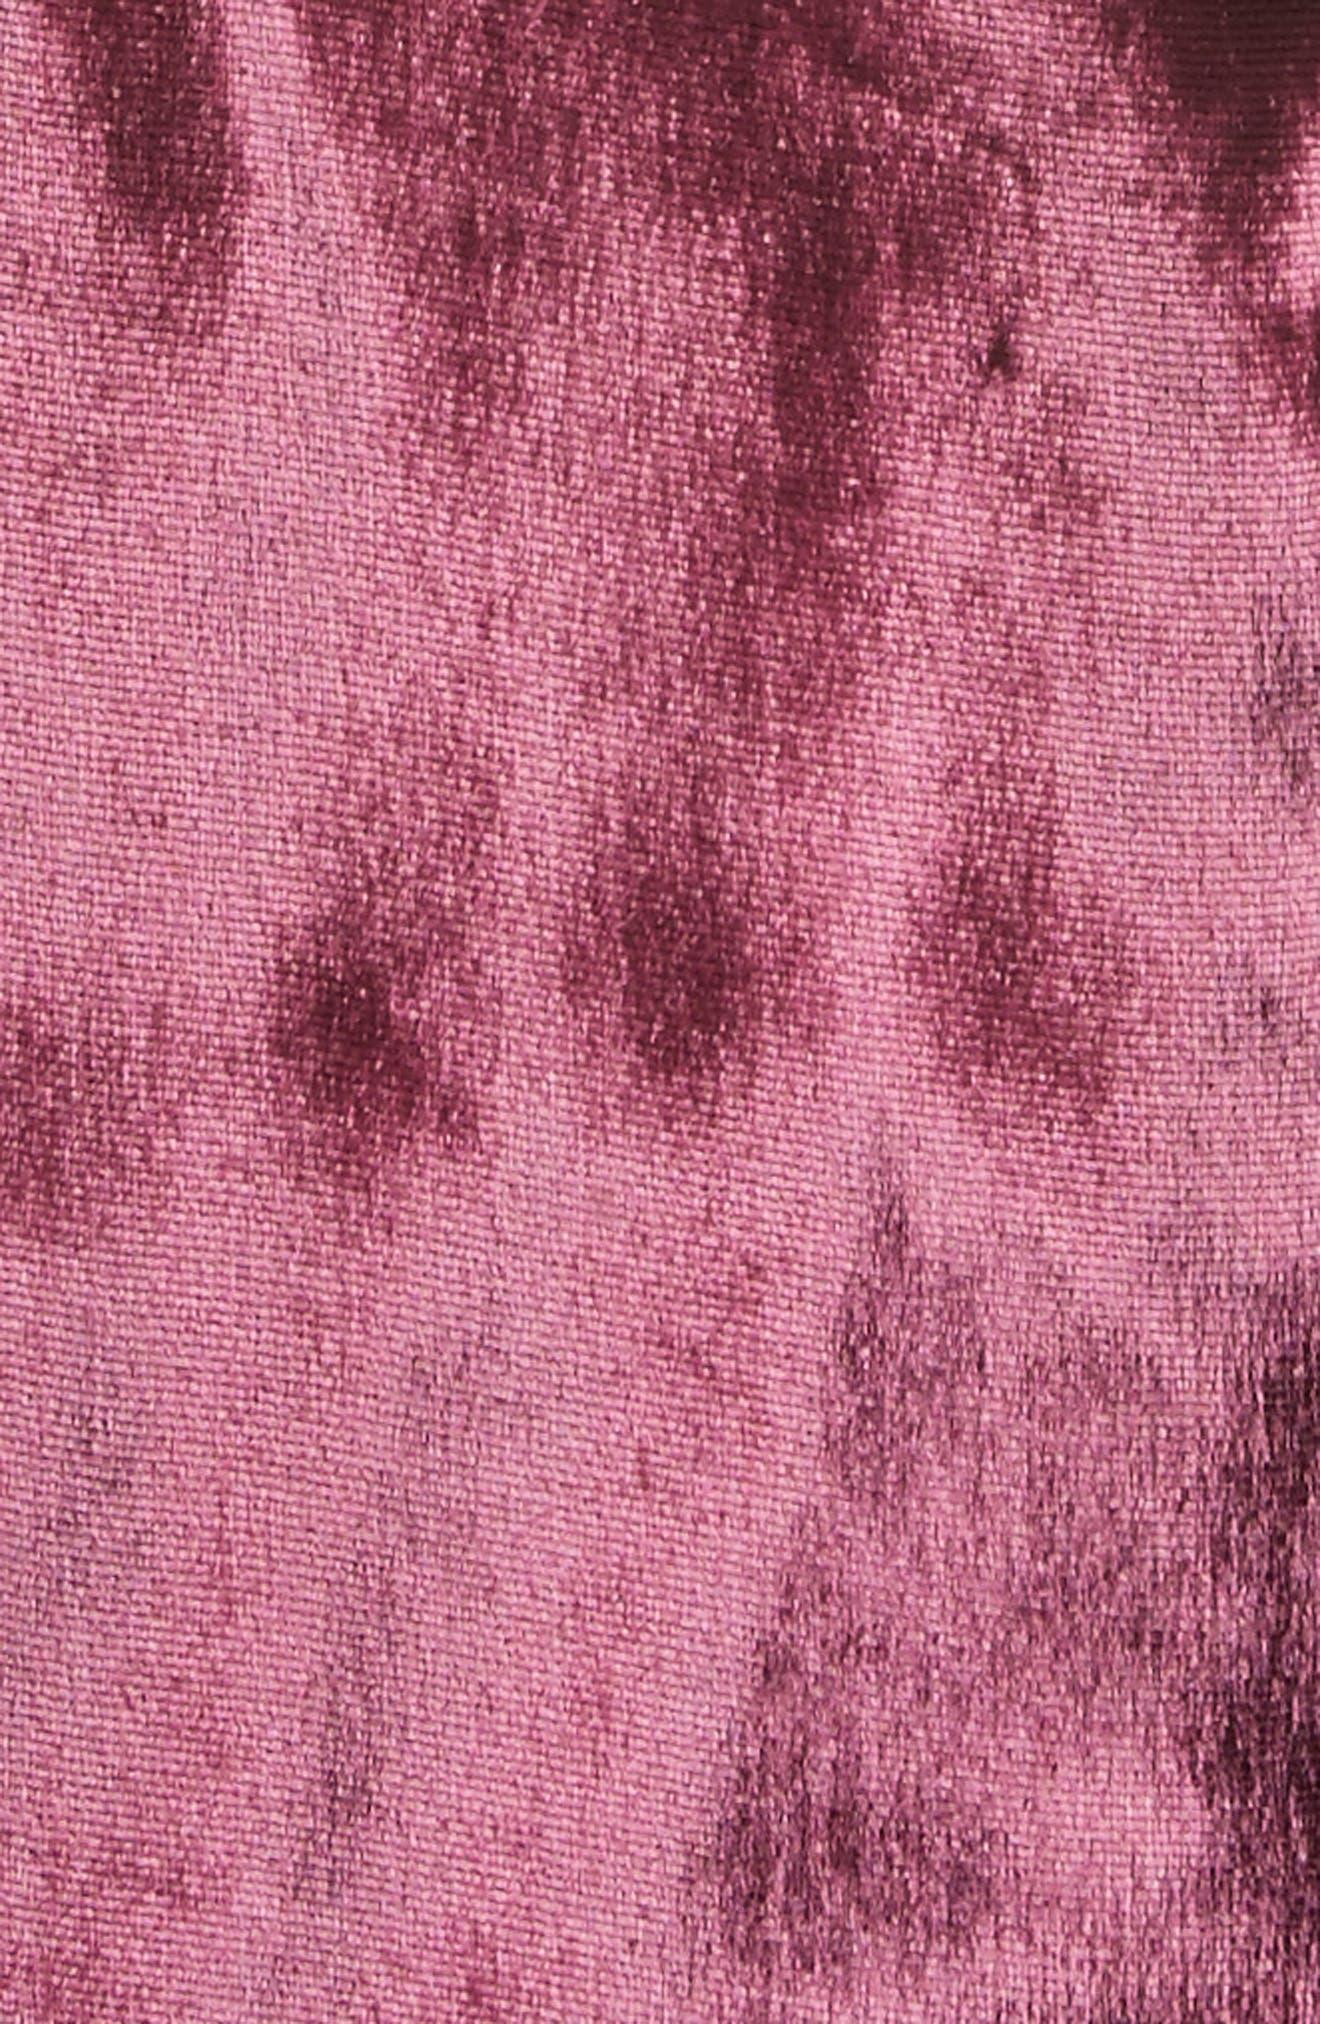 Panne Velvet Body-Con Off-the-Shoulder Dress,                             Alternate thumbnail 5, color,